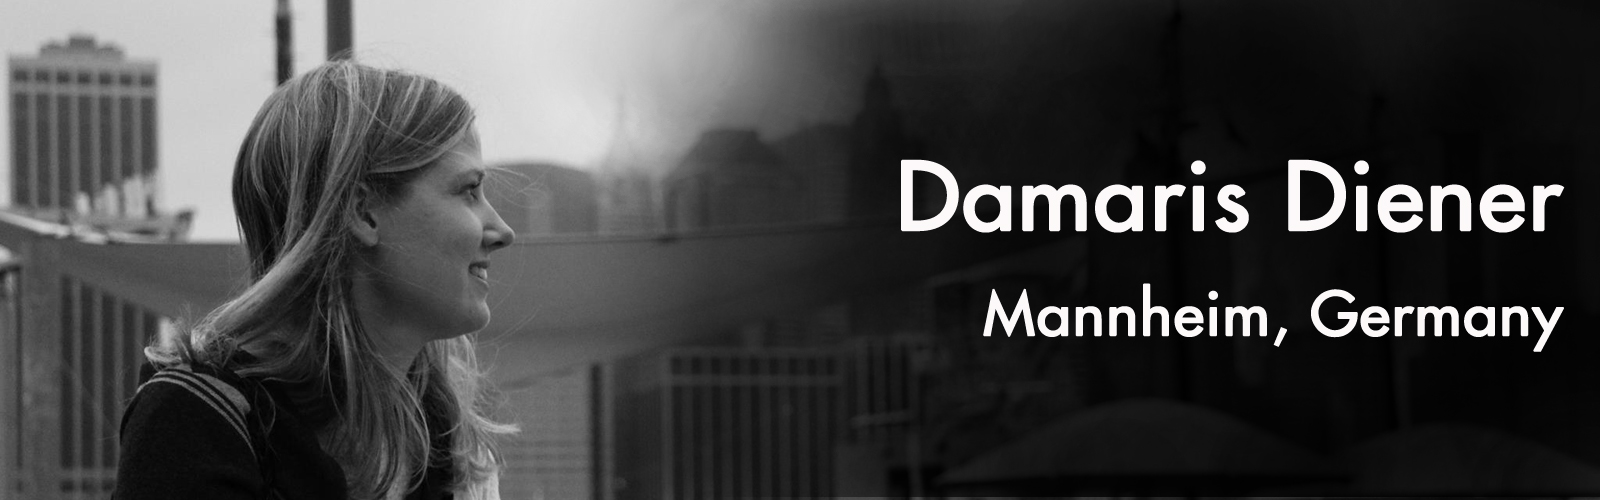 Damaris Diener, 2015